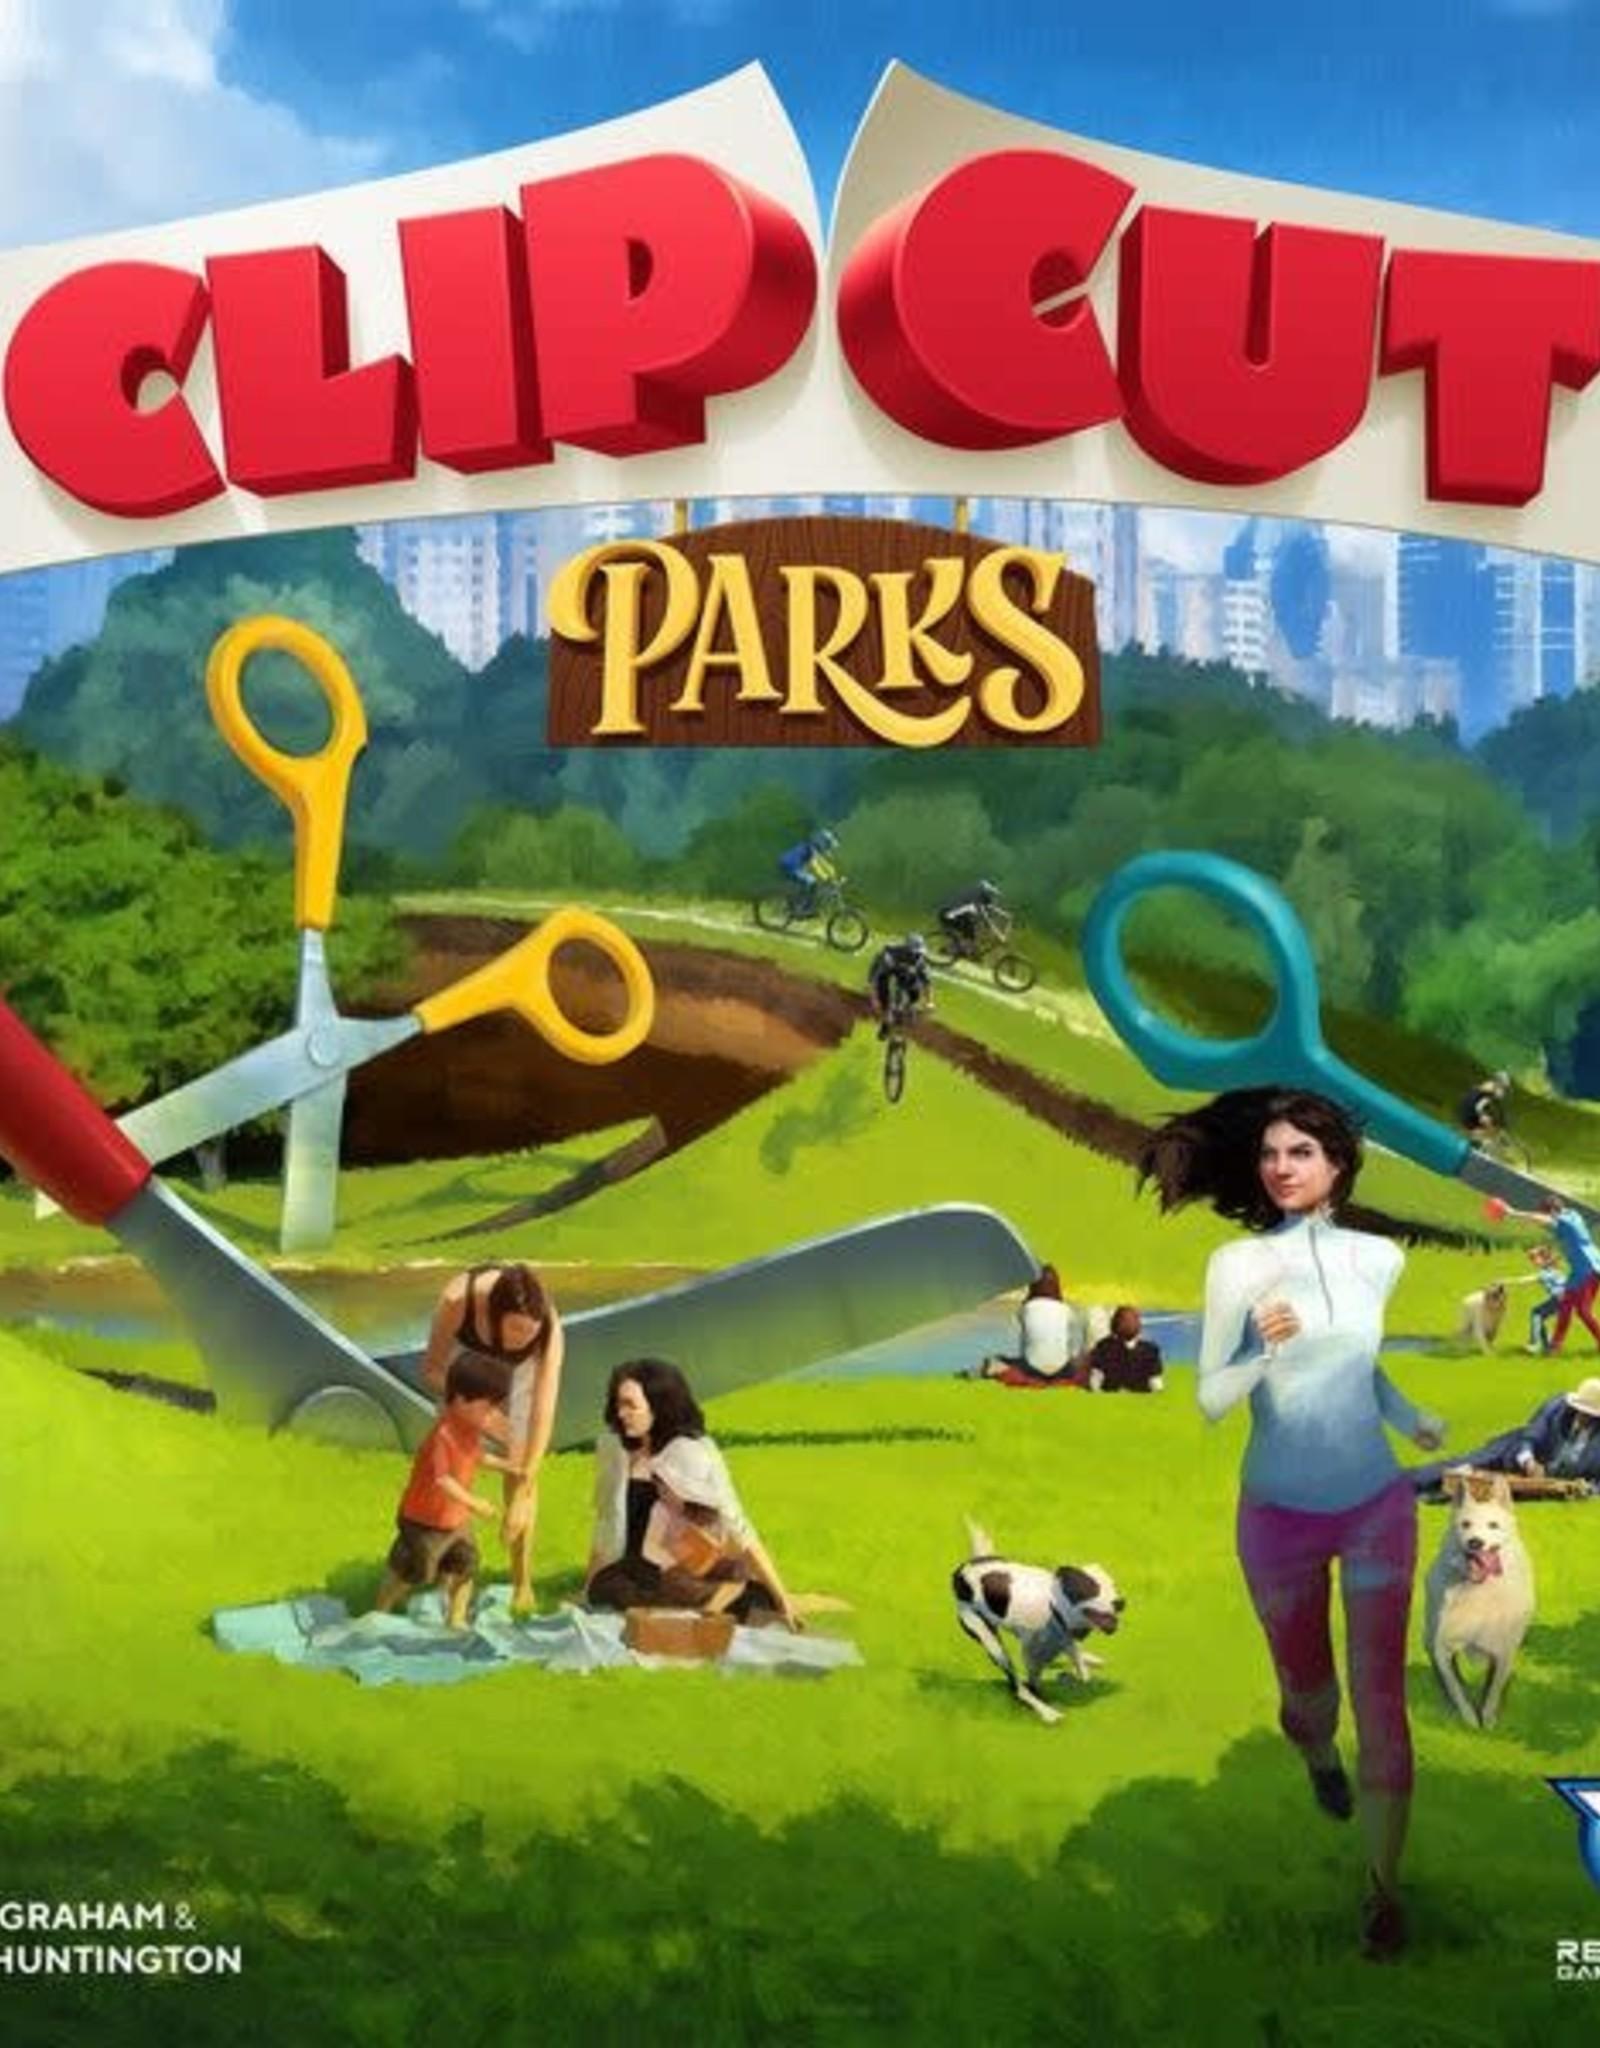 Renegade Game Studios ClipCut: Parks